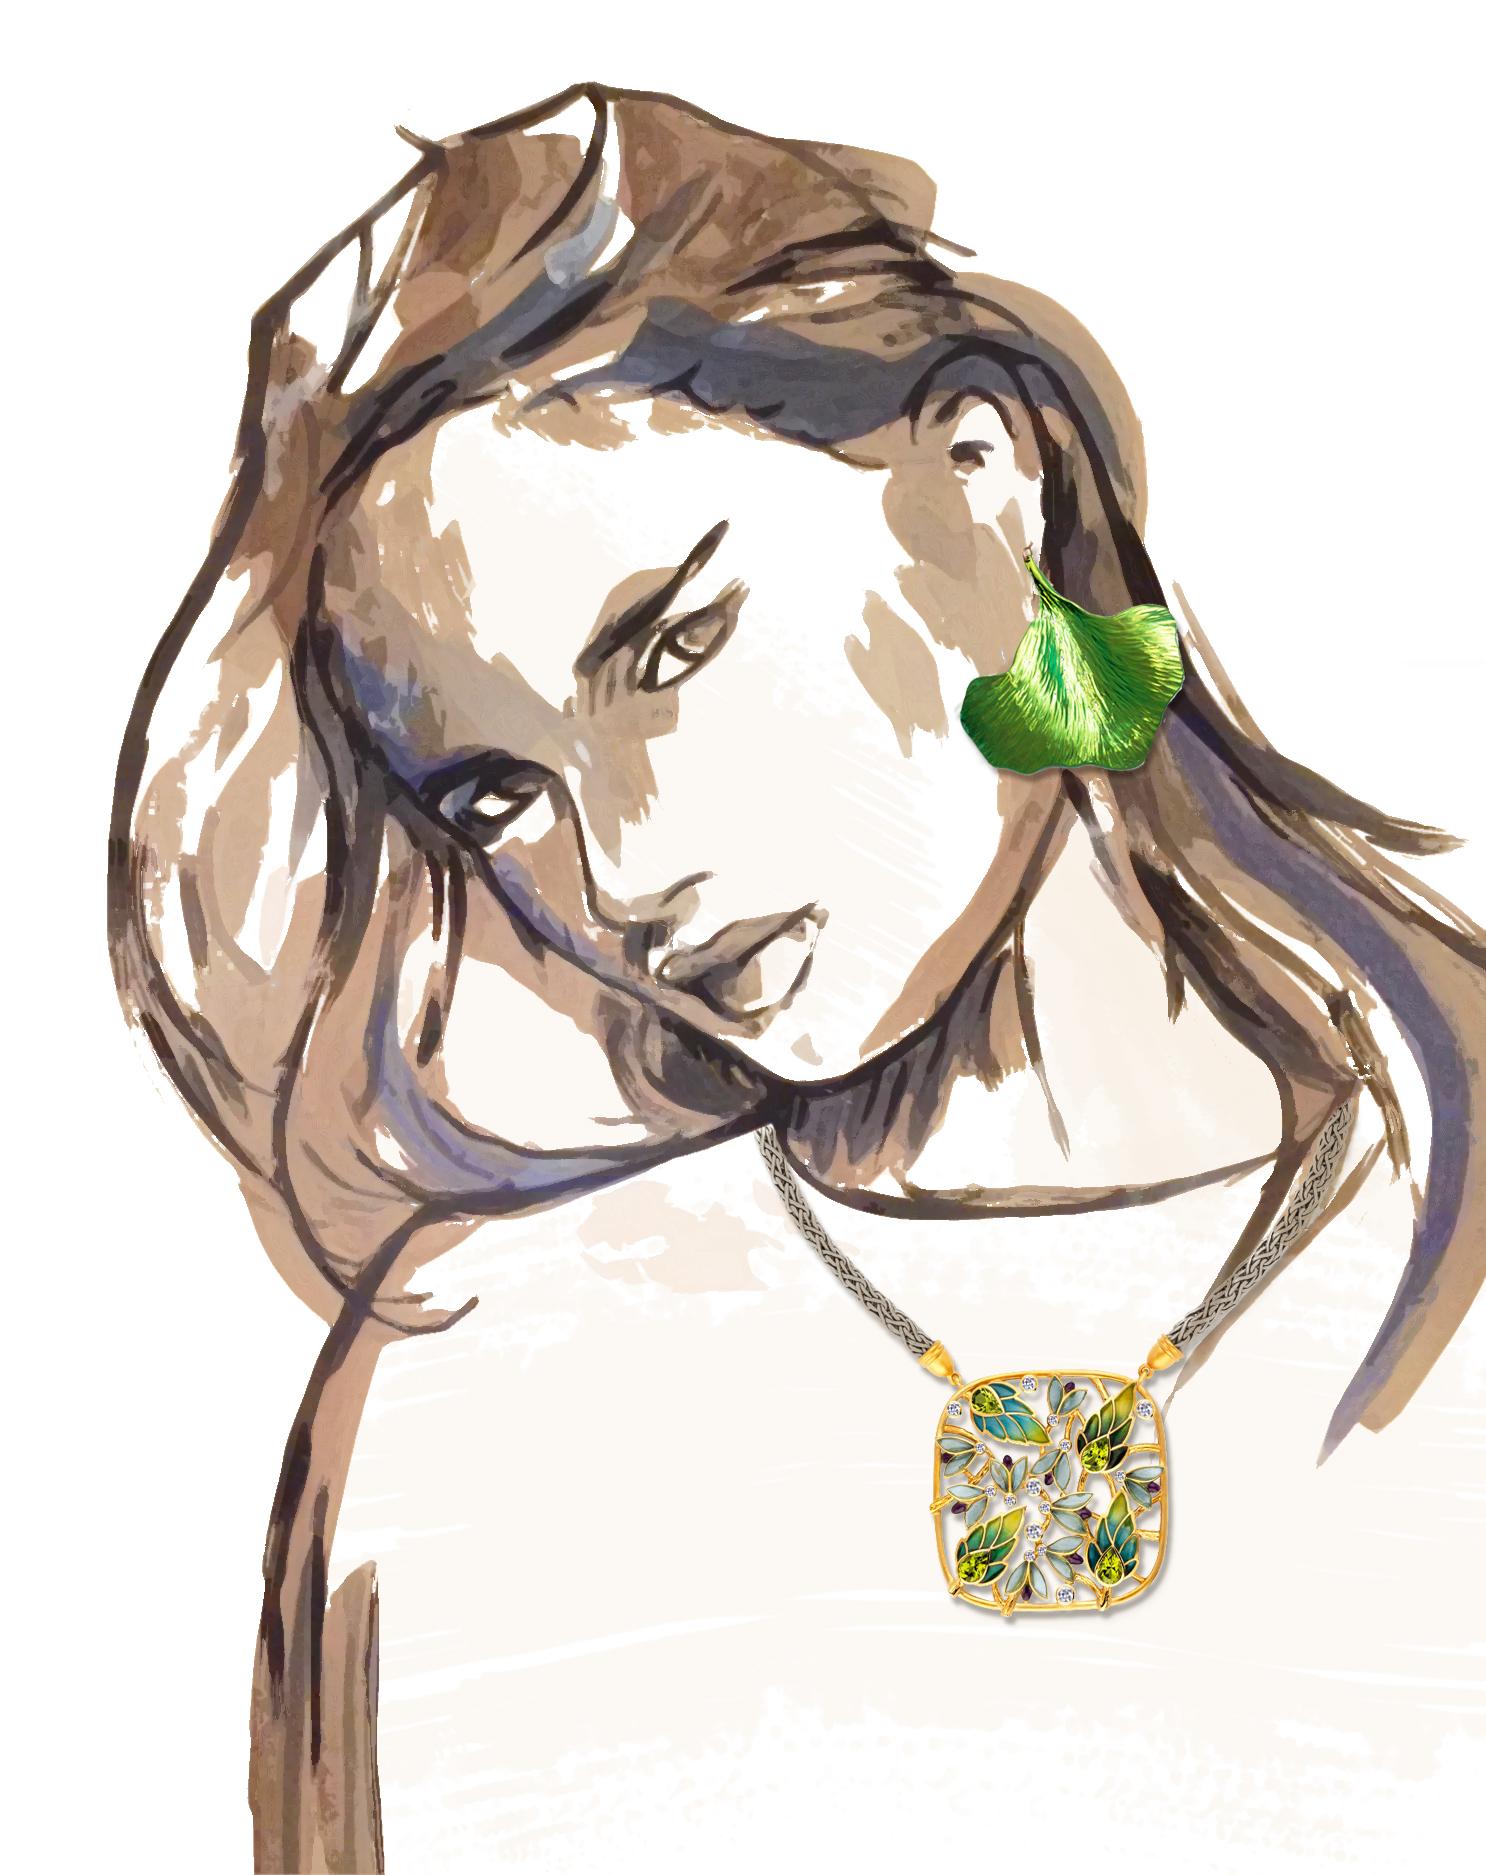 5- Ilya and Emilia Kabakov The Fly neckalce; Ania Guillaume Butterfly Wings earrings